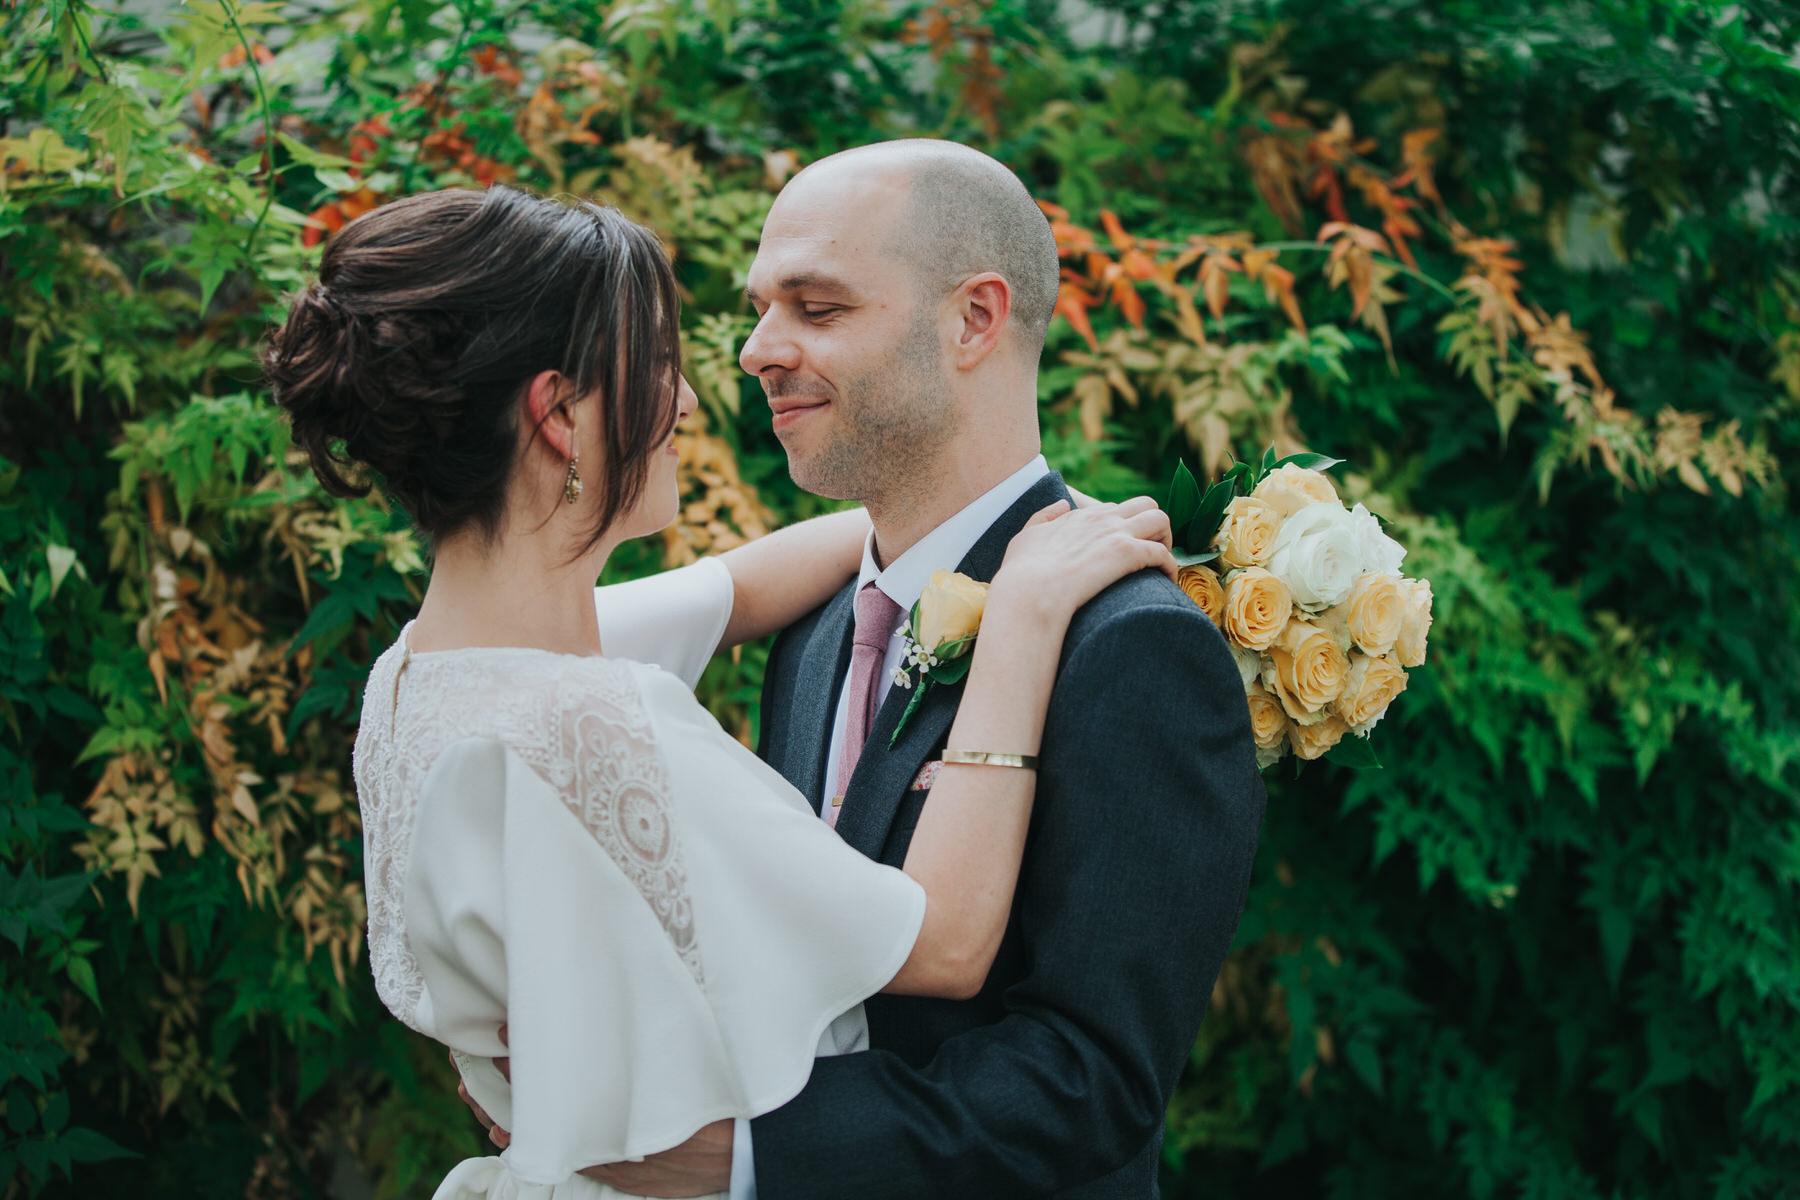 129 bride groom embracing romantic portraits.jpg